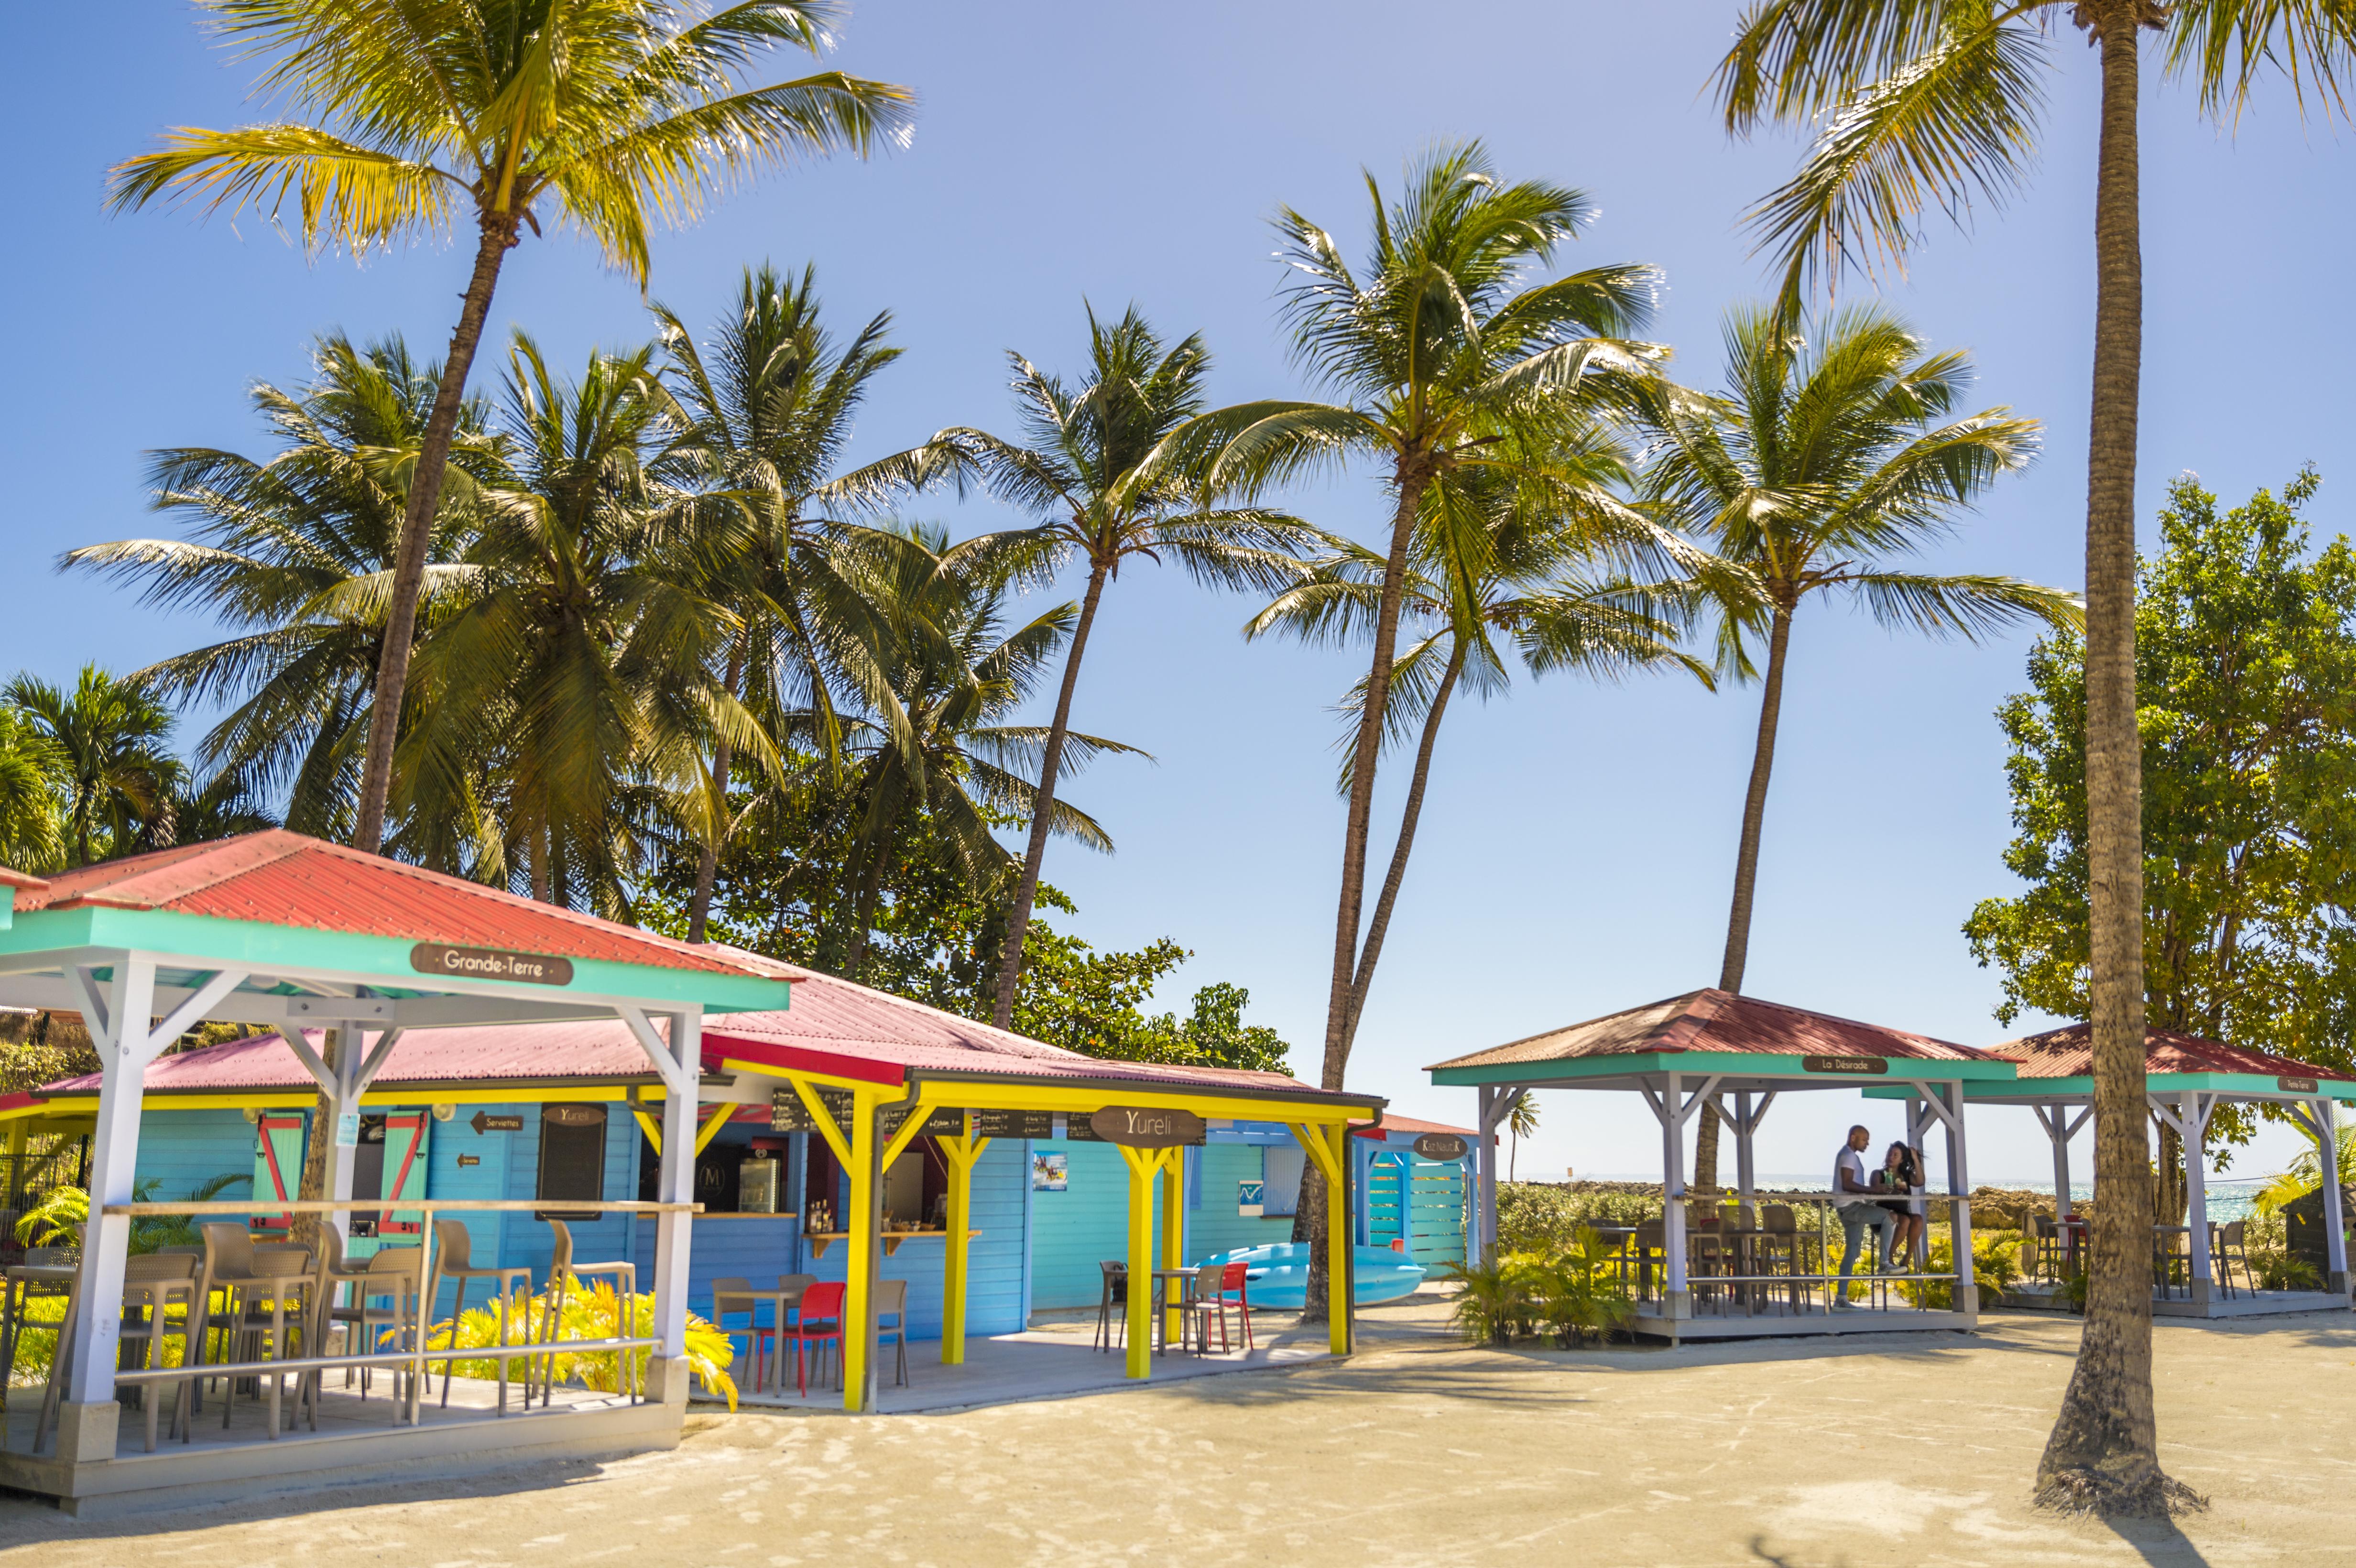 Le Yureli Beach Bar